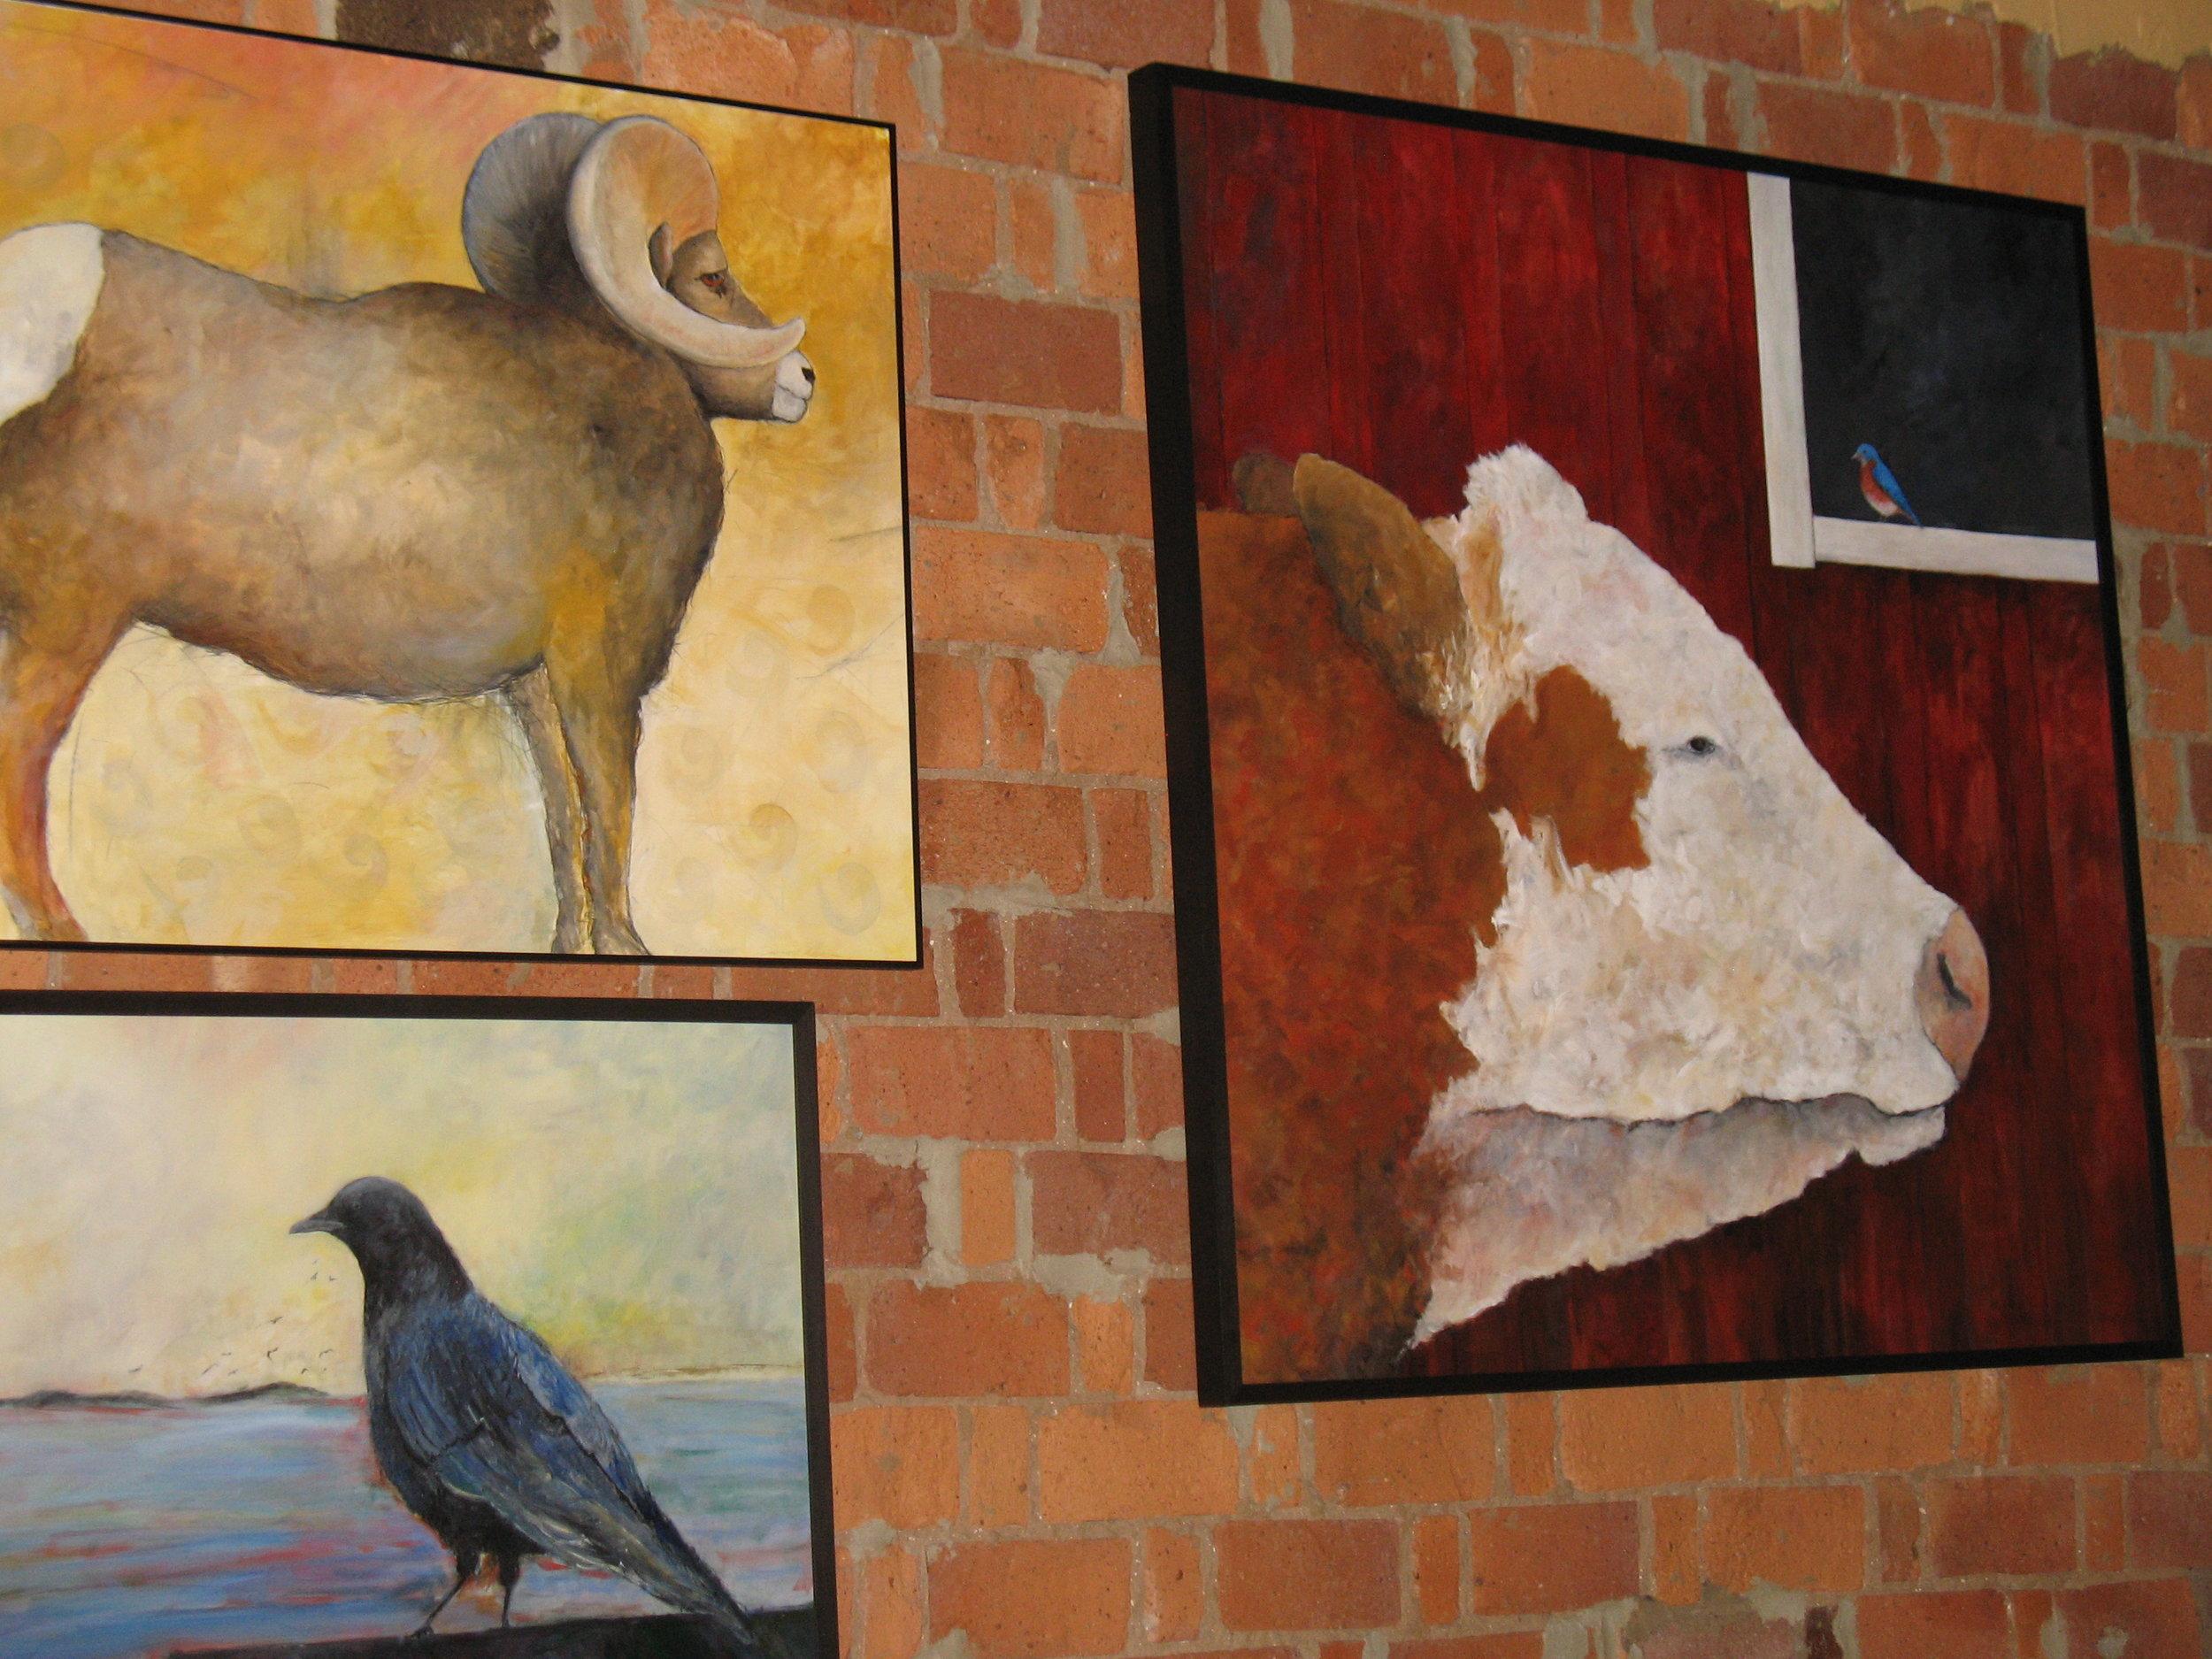 Artwork displayed at FFDT venue Clementine, 2012